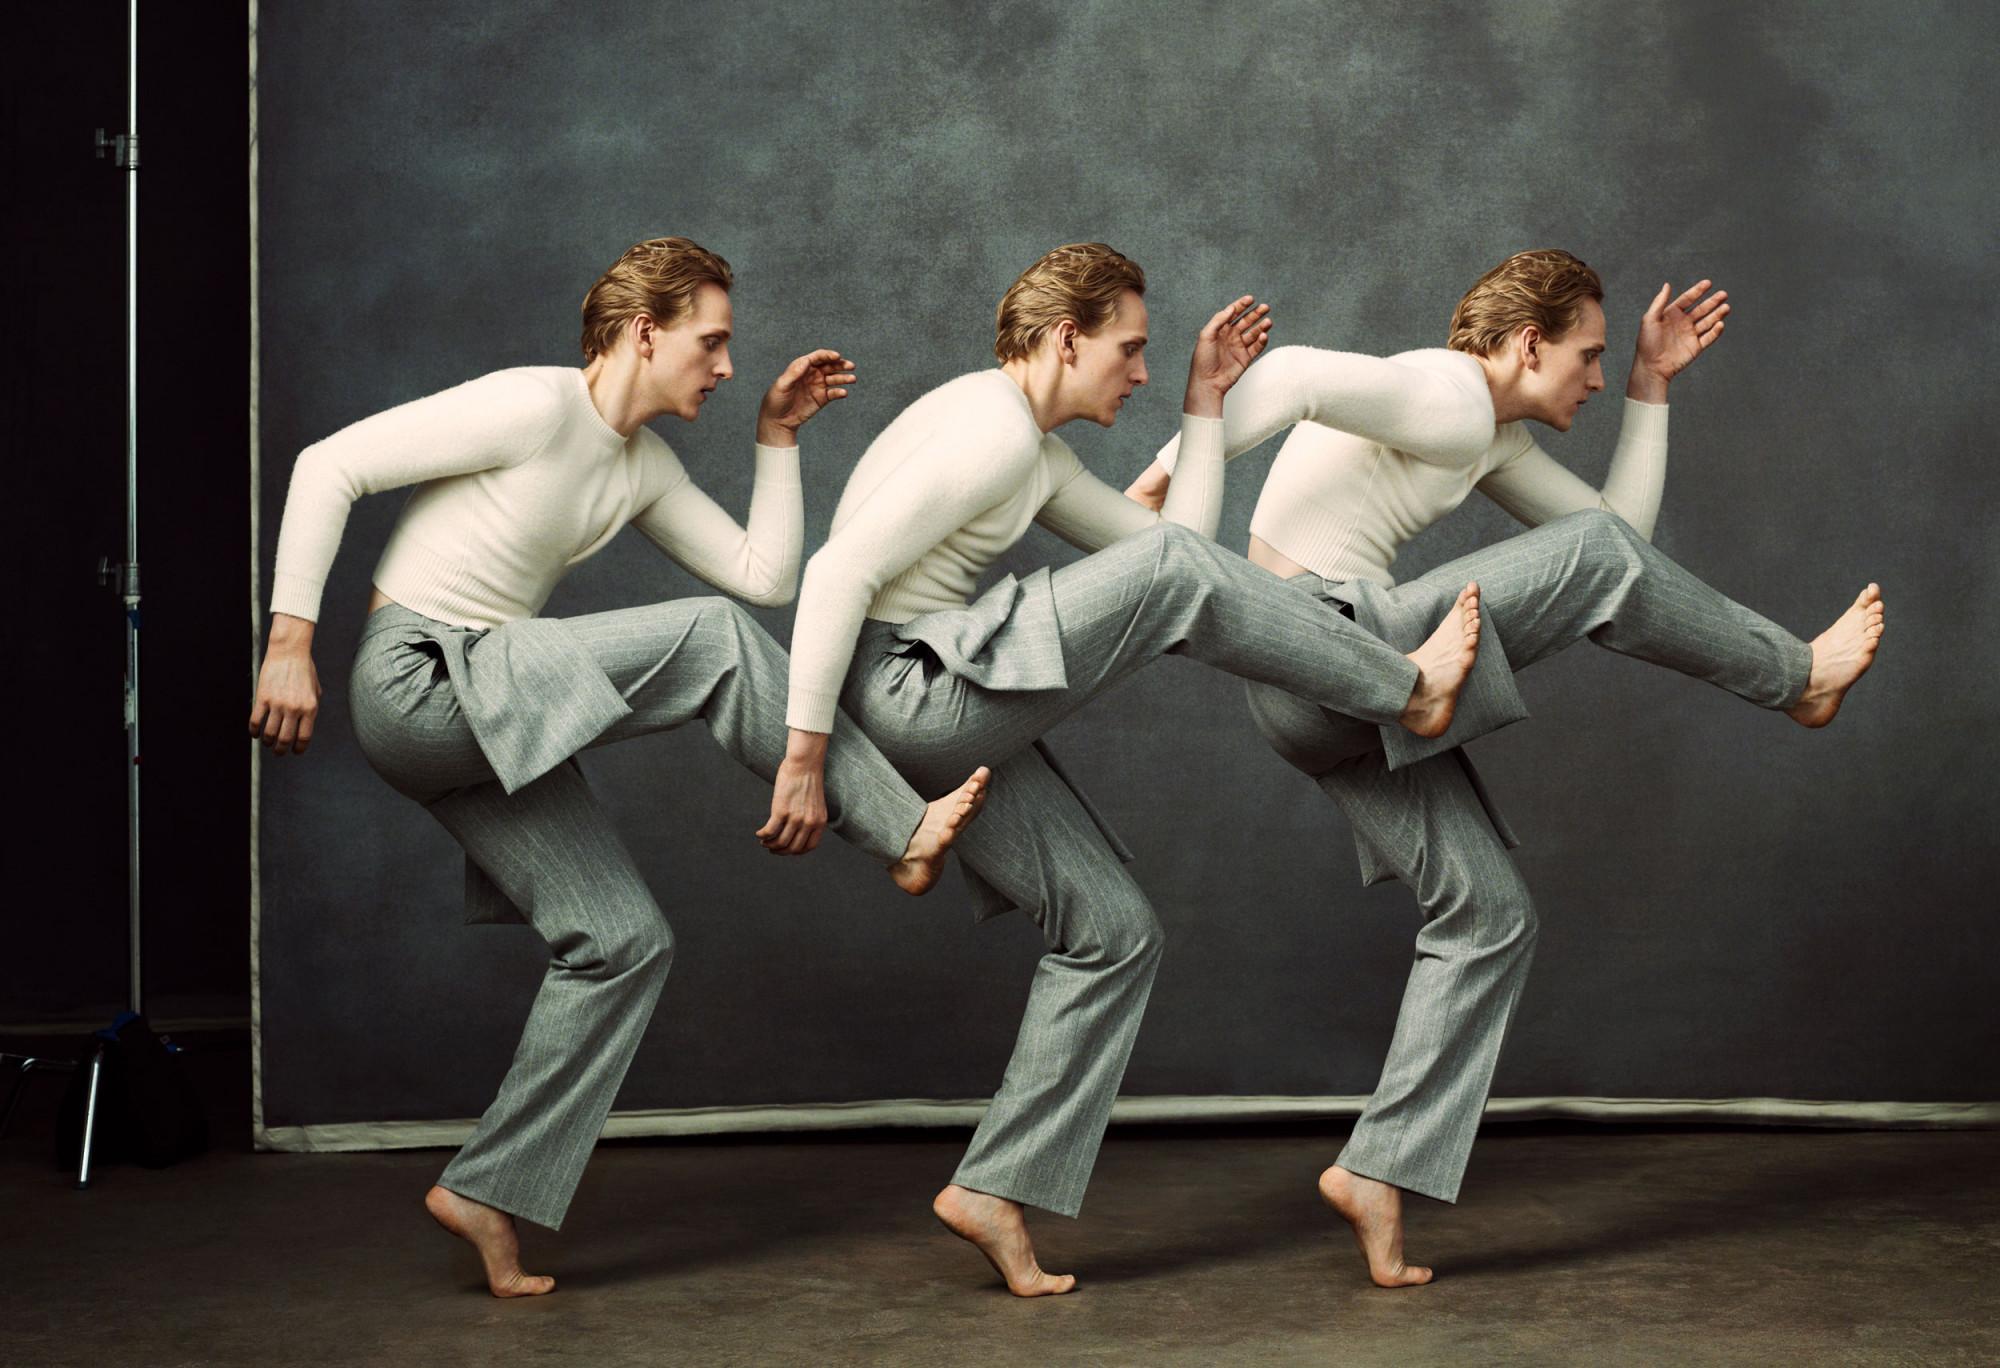 Bjorn Iooss CR Fashion Book - David Hallberg